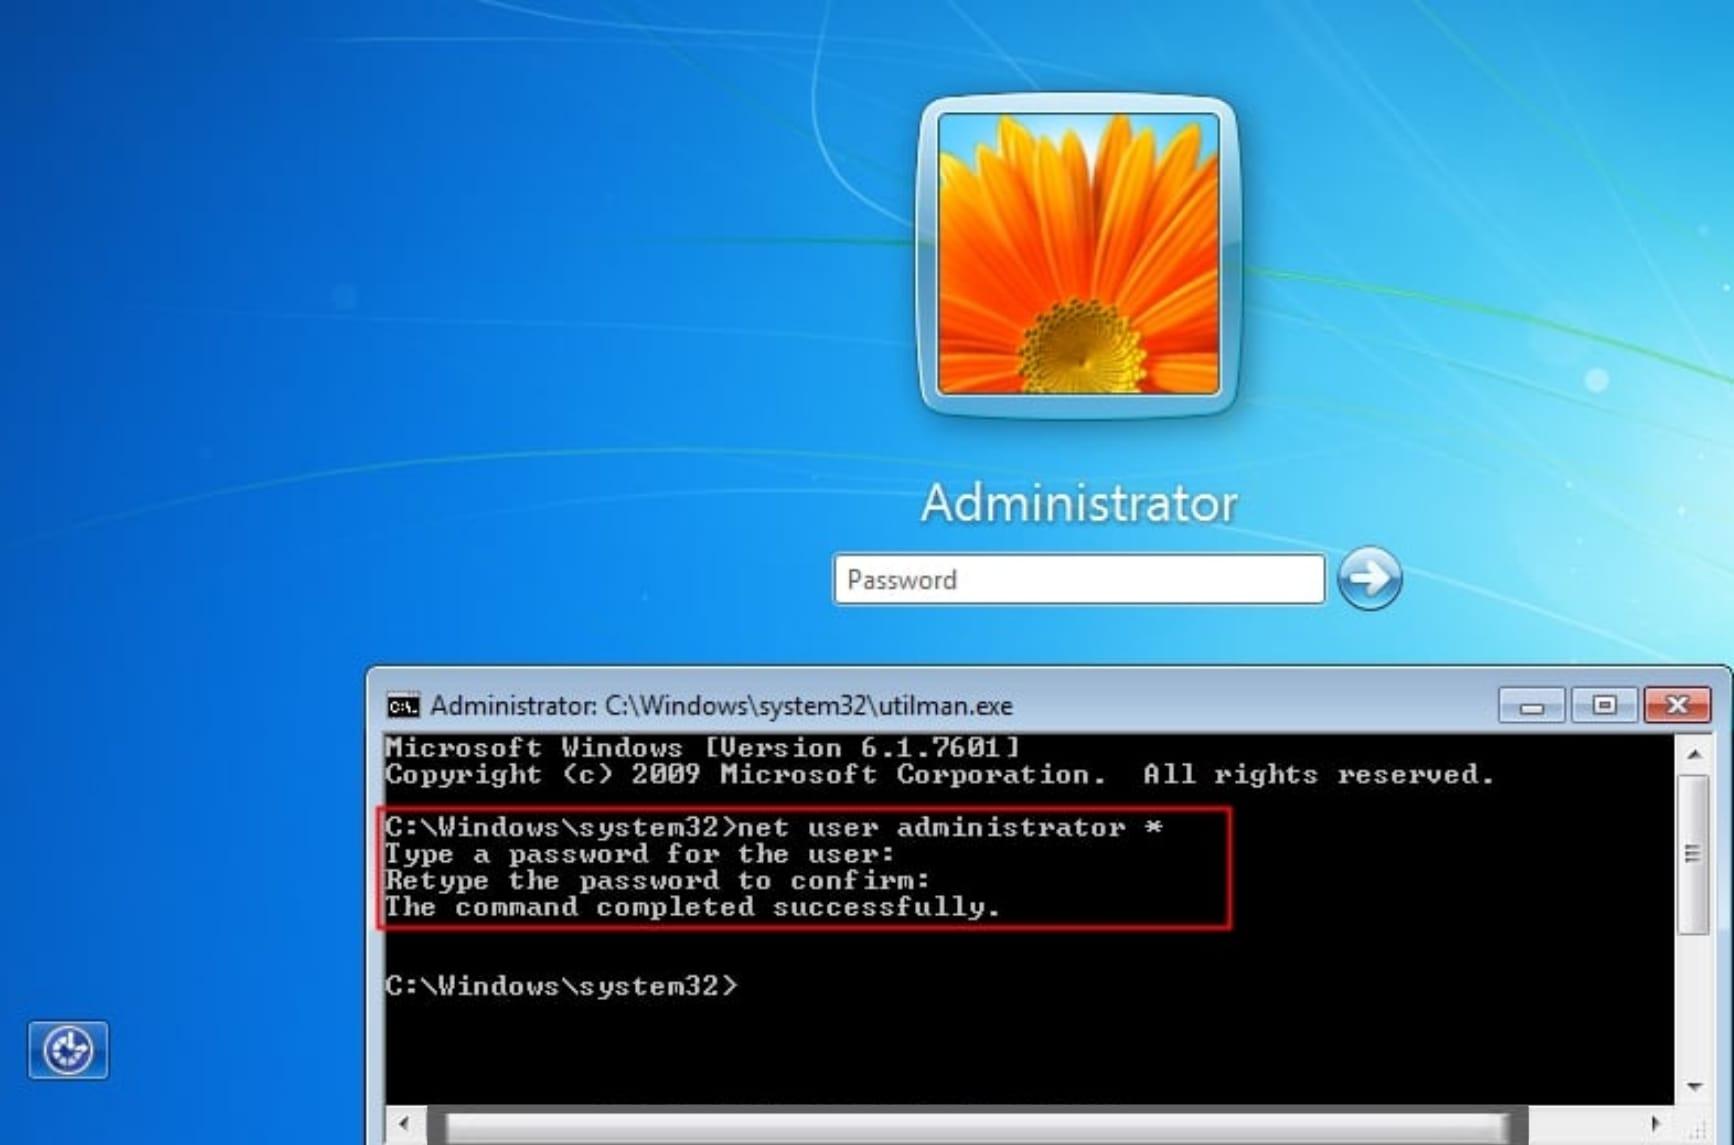 Windows 7  utilman command prompt